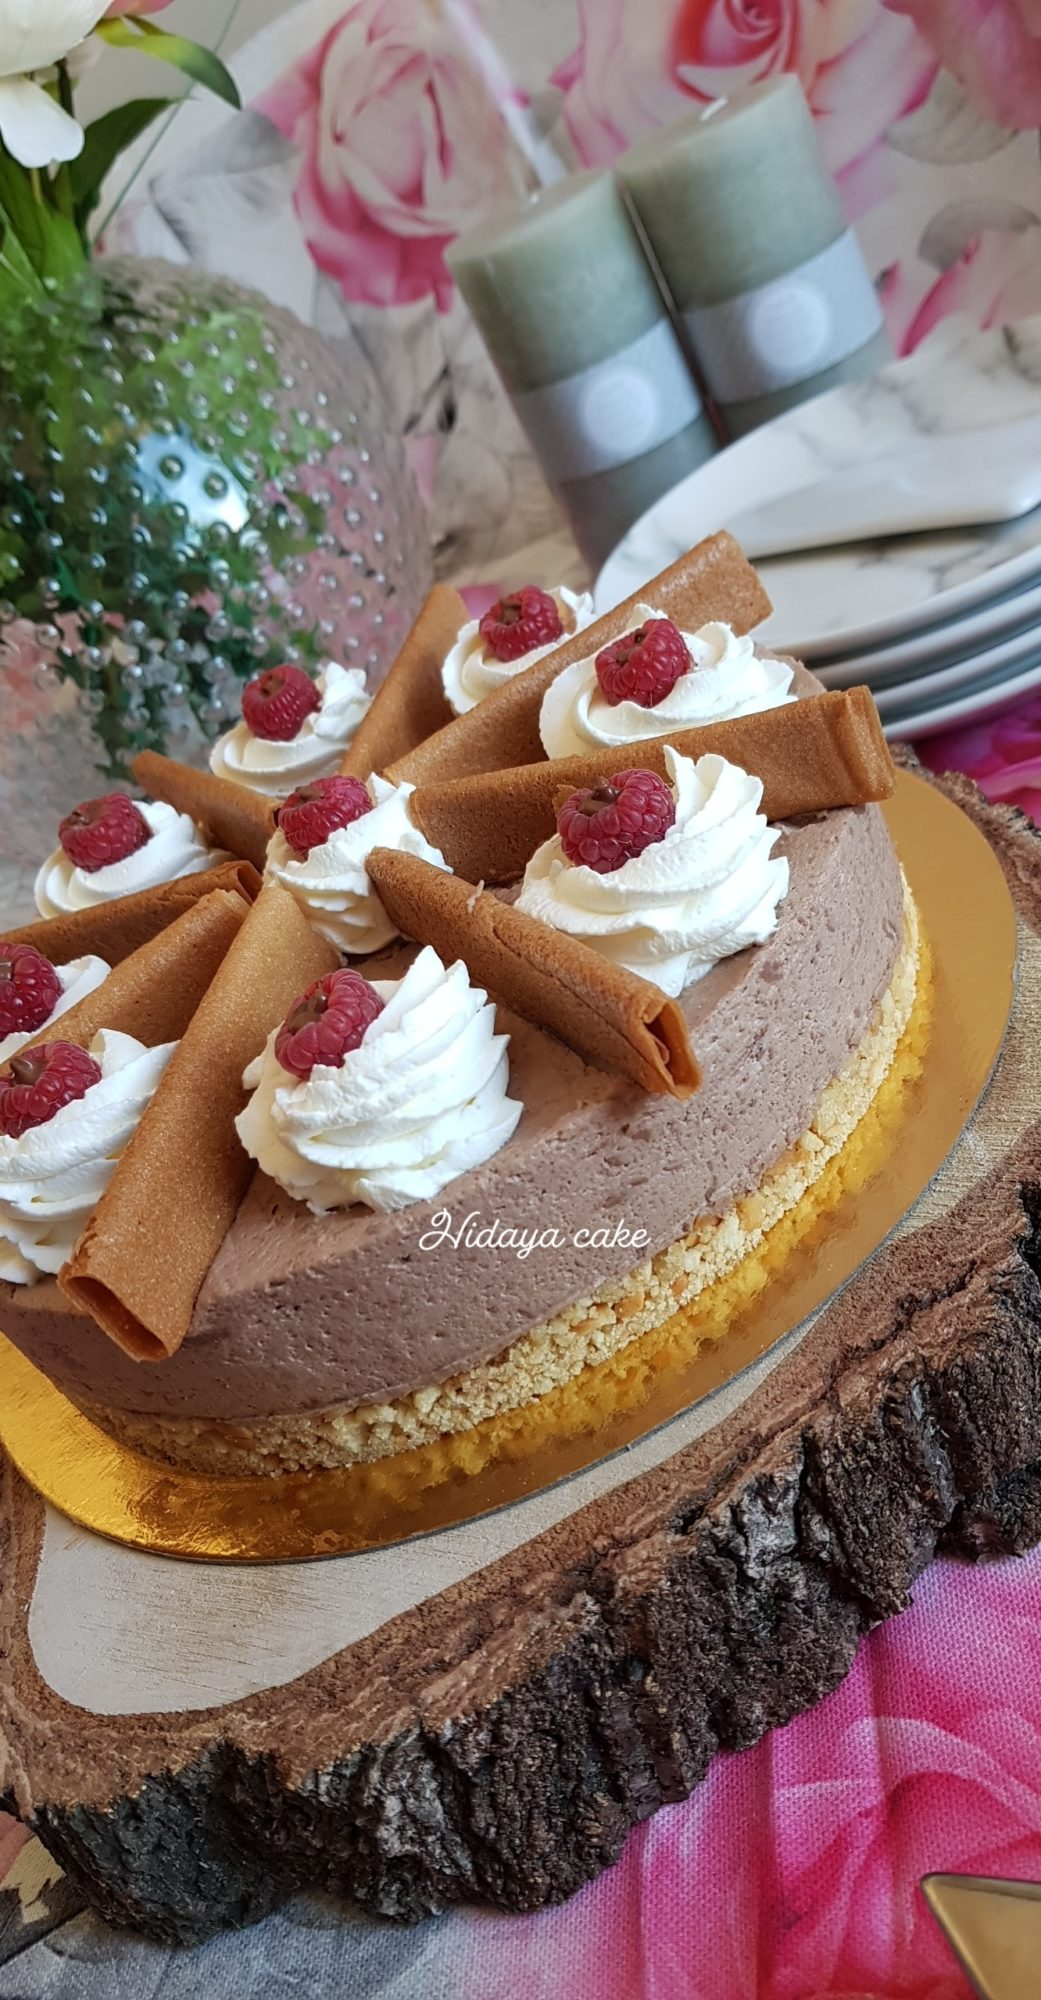 Cheesecake au chocolat au lait et aux framboises